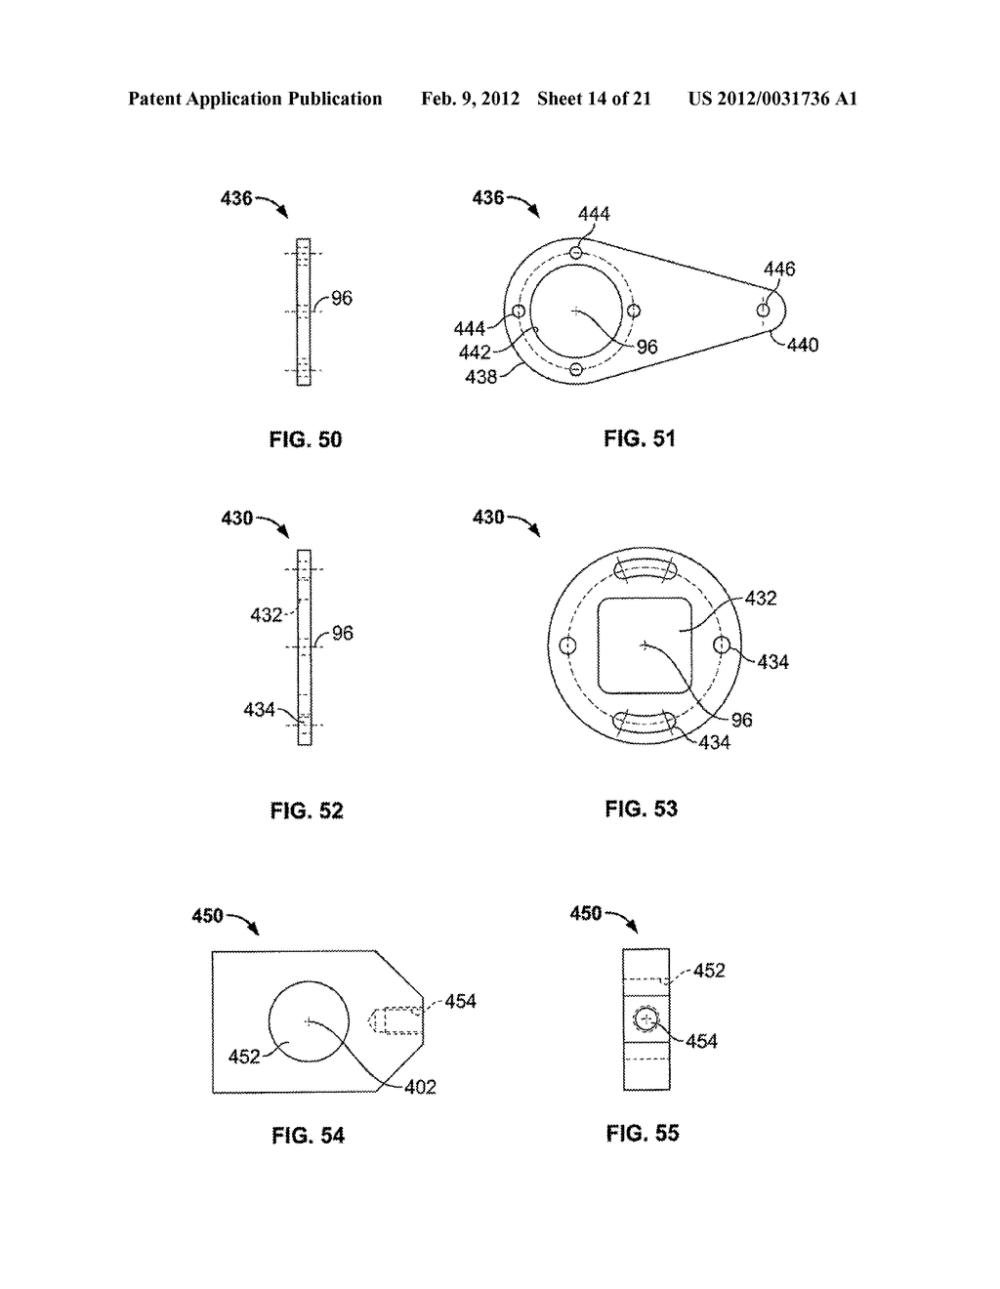 medium resolution of method of adjusting conveyor belt scrapers and open loop control system for conveyor belt scrapers diagram schematic and image 15